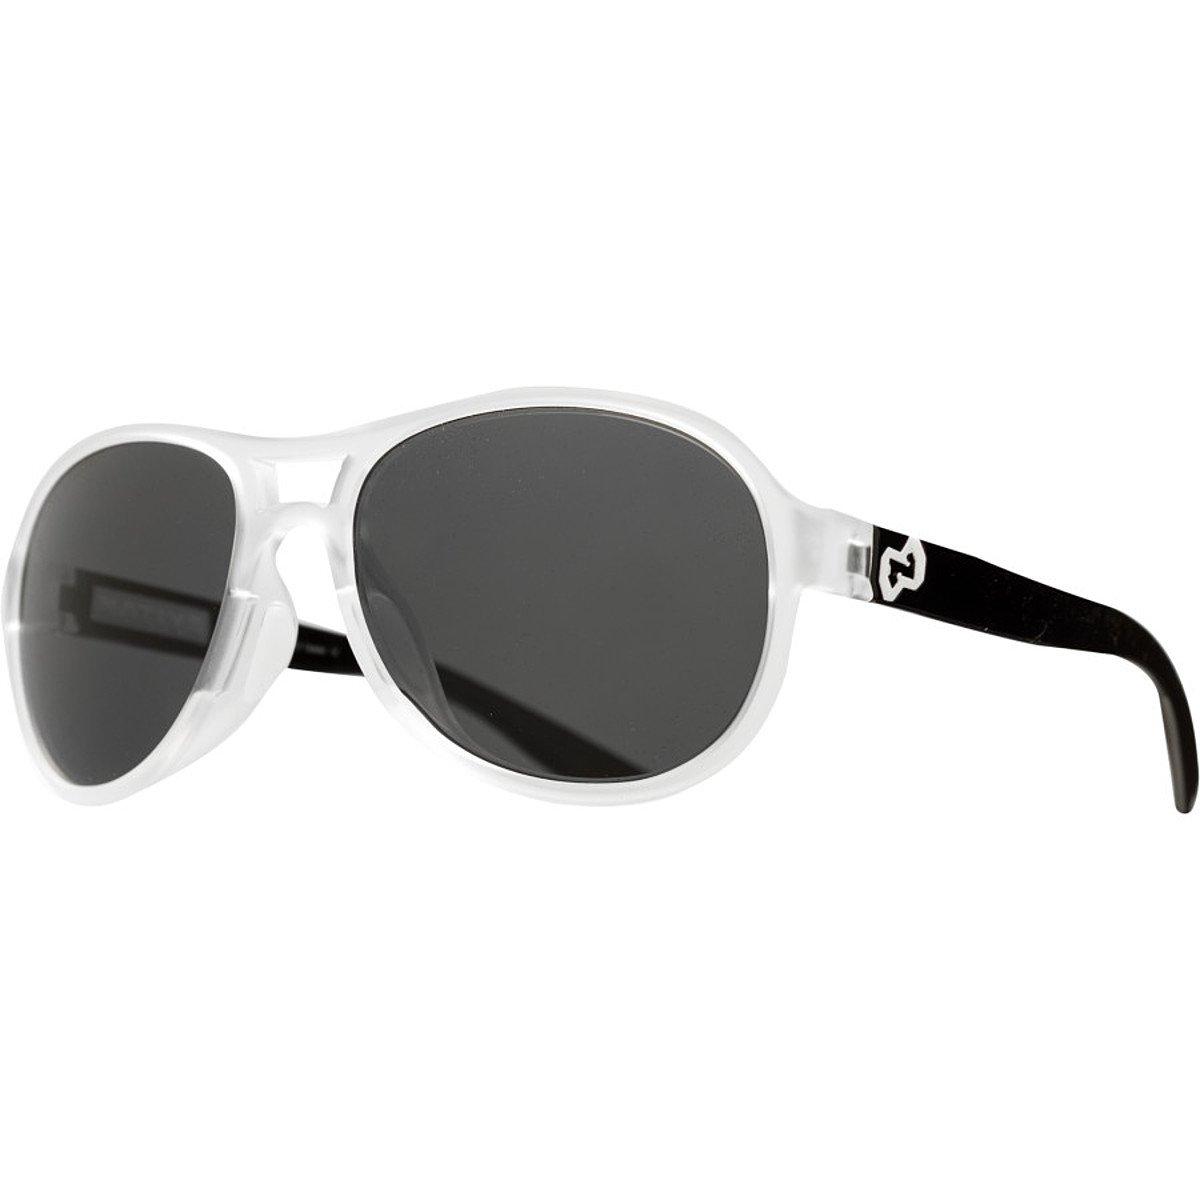 e1e68d66a7e Amazon.com  Native Eyewear Unisex Chilkat Crystal Frost Gloss Black One  Size  Clothing